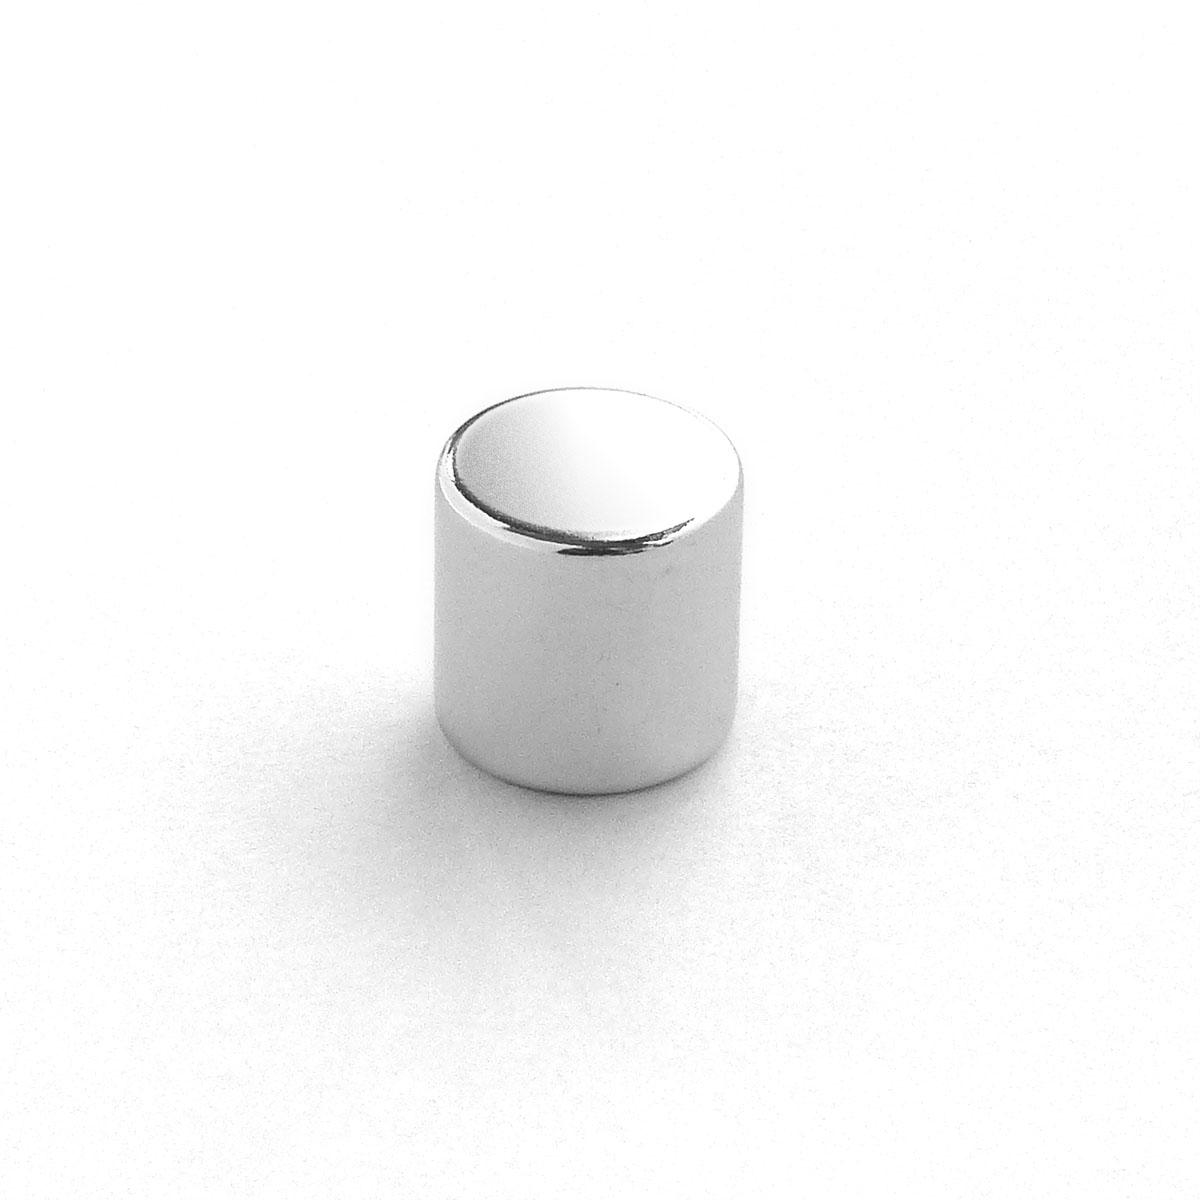 Cylinder Neodymium Magnets 10mm Dia x 10mm